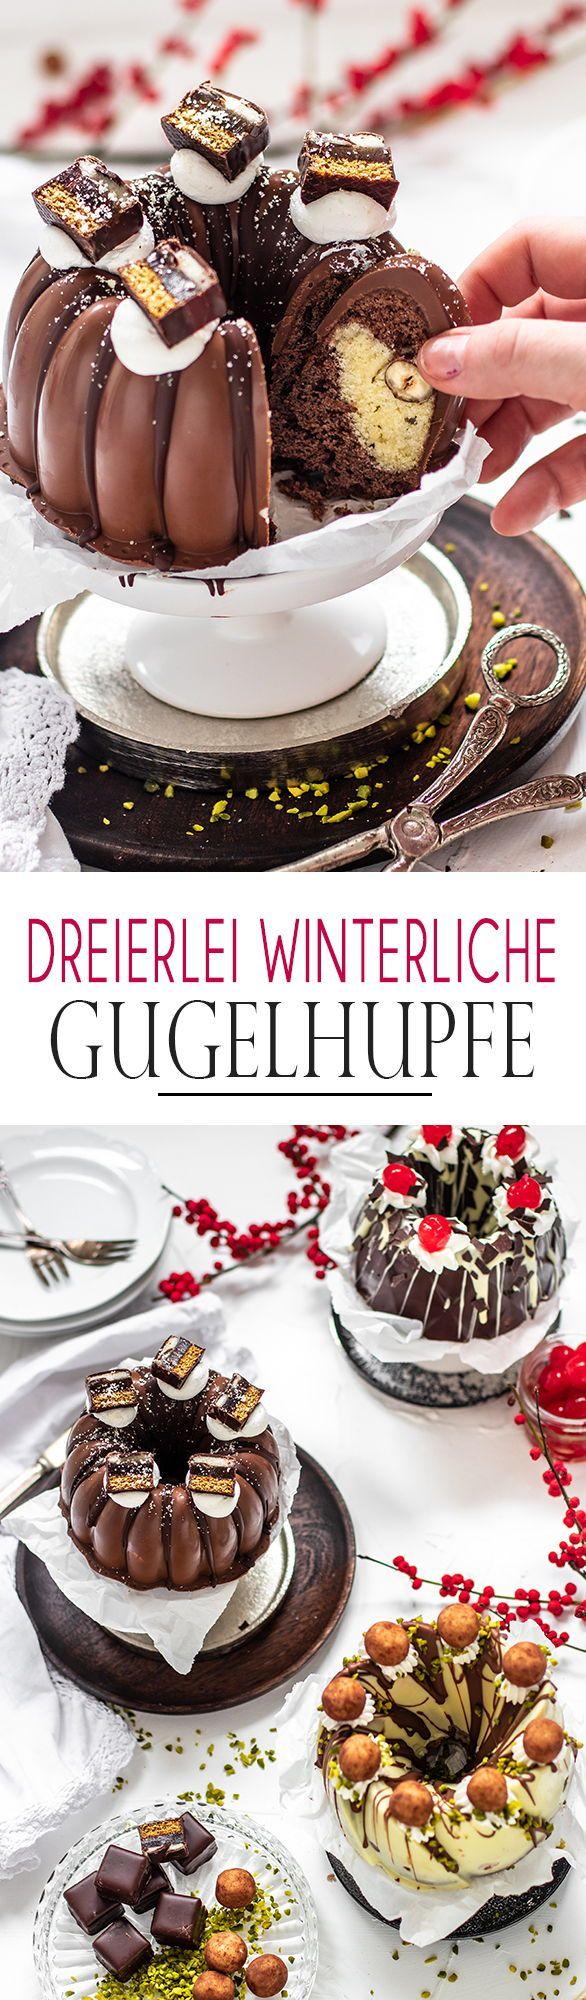 Photo of KüchenDeern – The Hamburg backblog for cakes and tarts